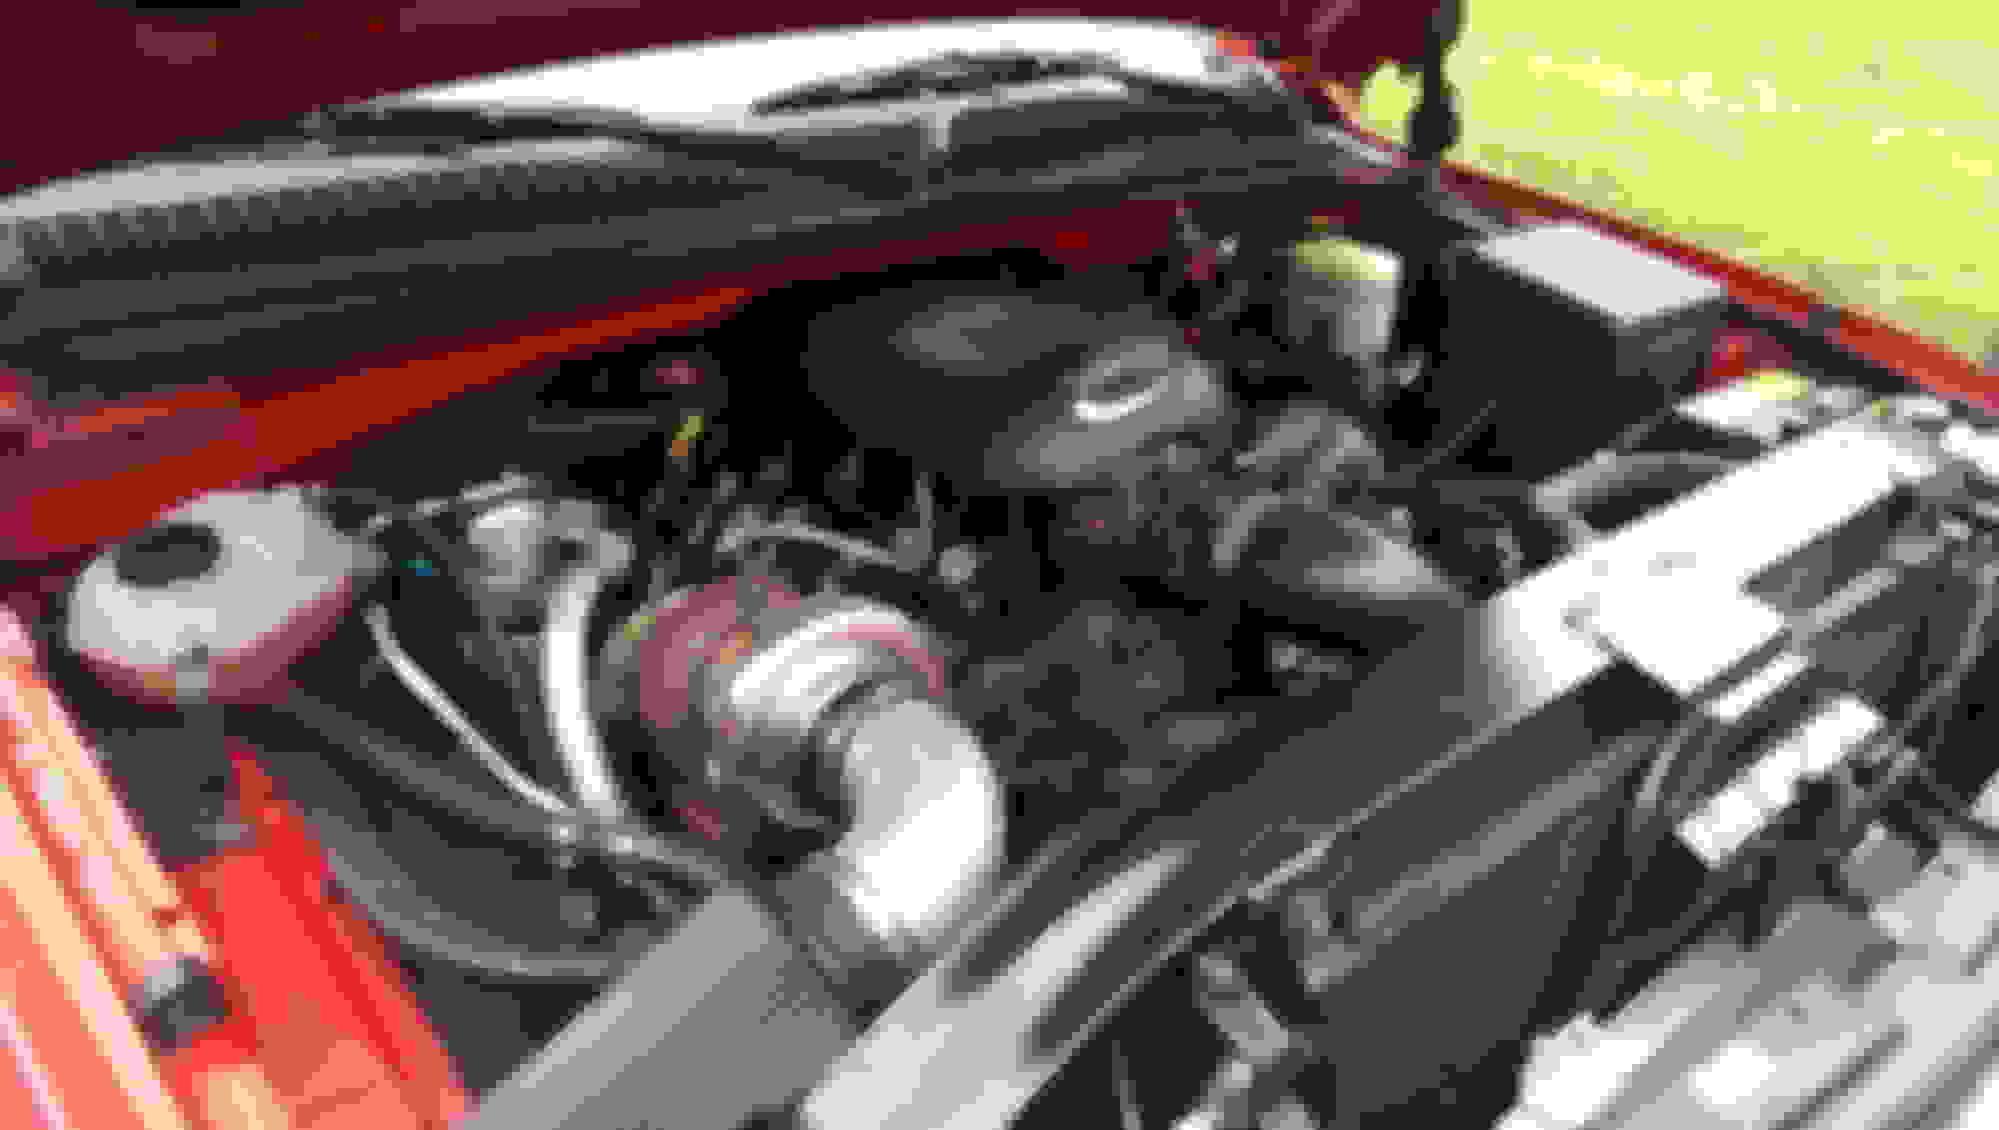 Turbo ext cab rear end - PerformanceTrucks net Forums